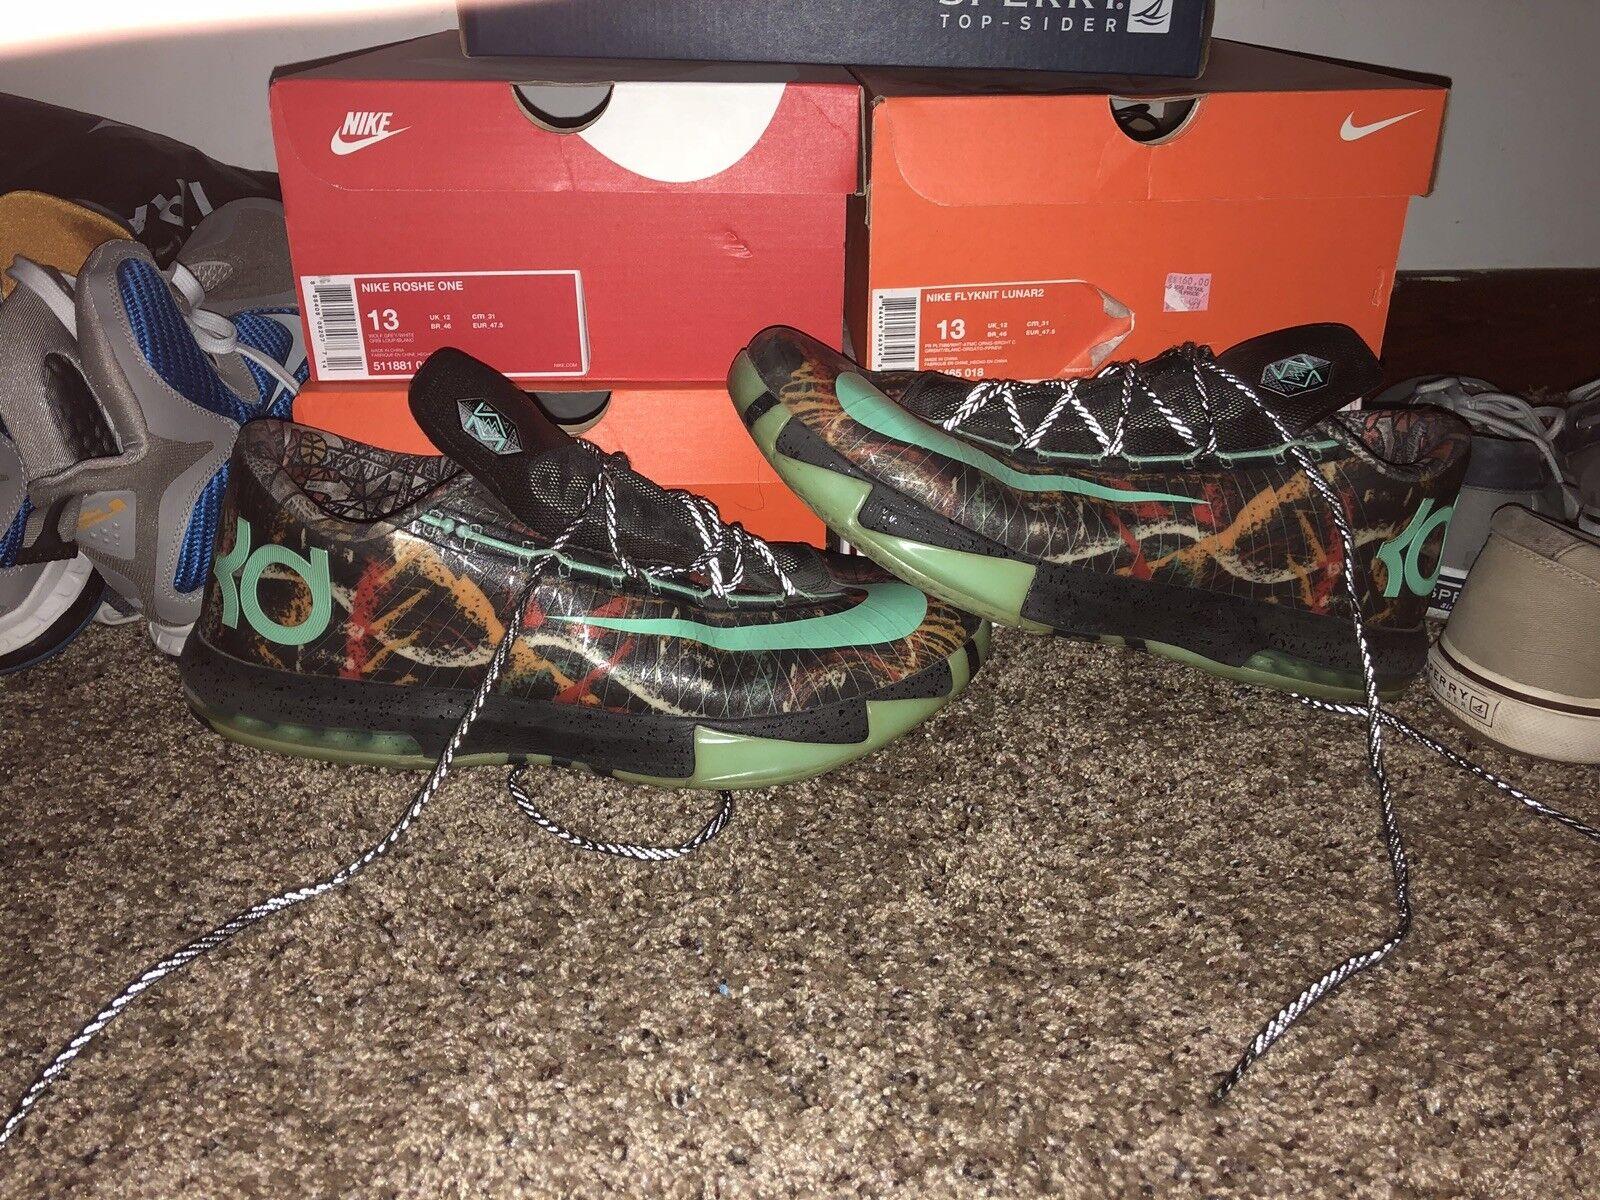 Nike KD VI AS 'All-Star' Multi-Color/Green Glow-Black, men's size 14